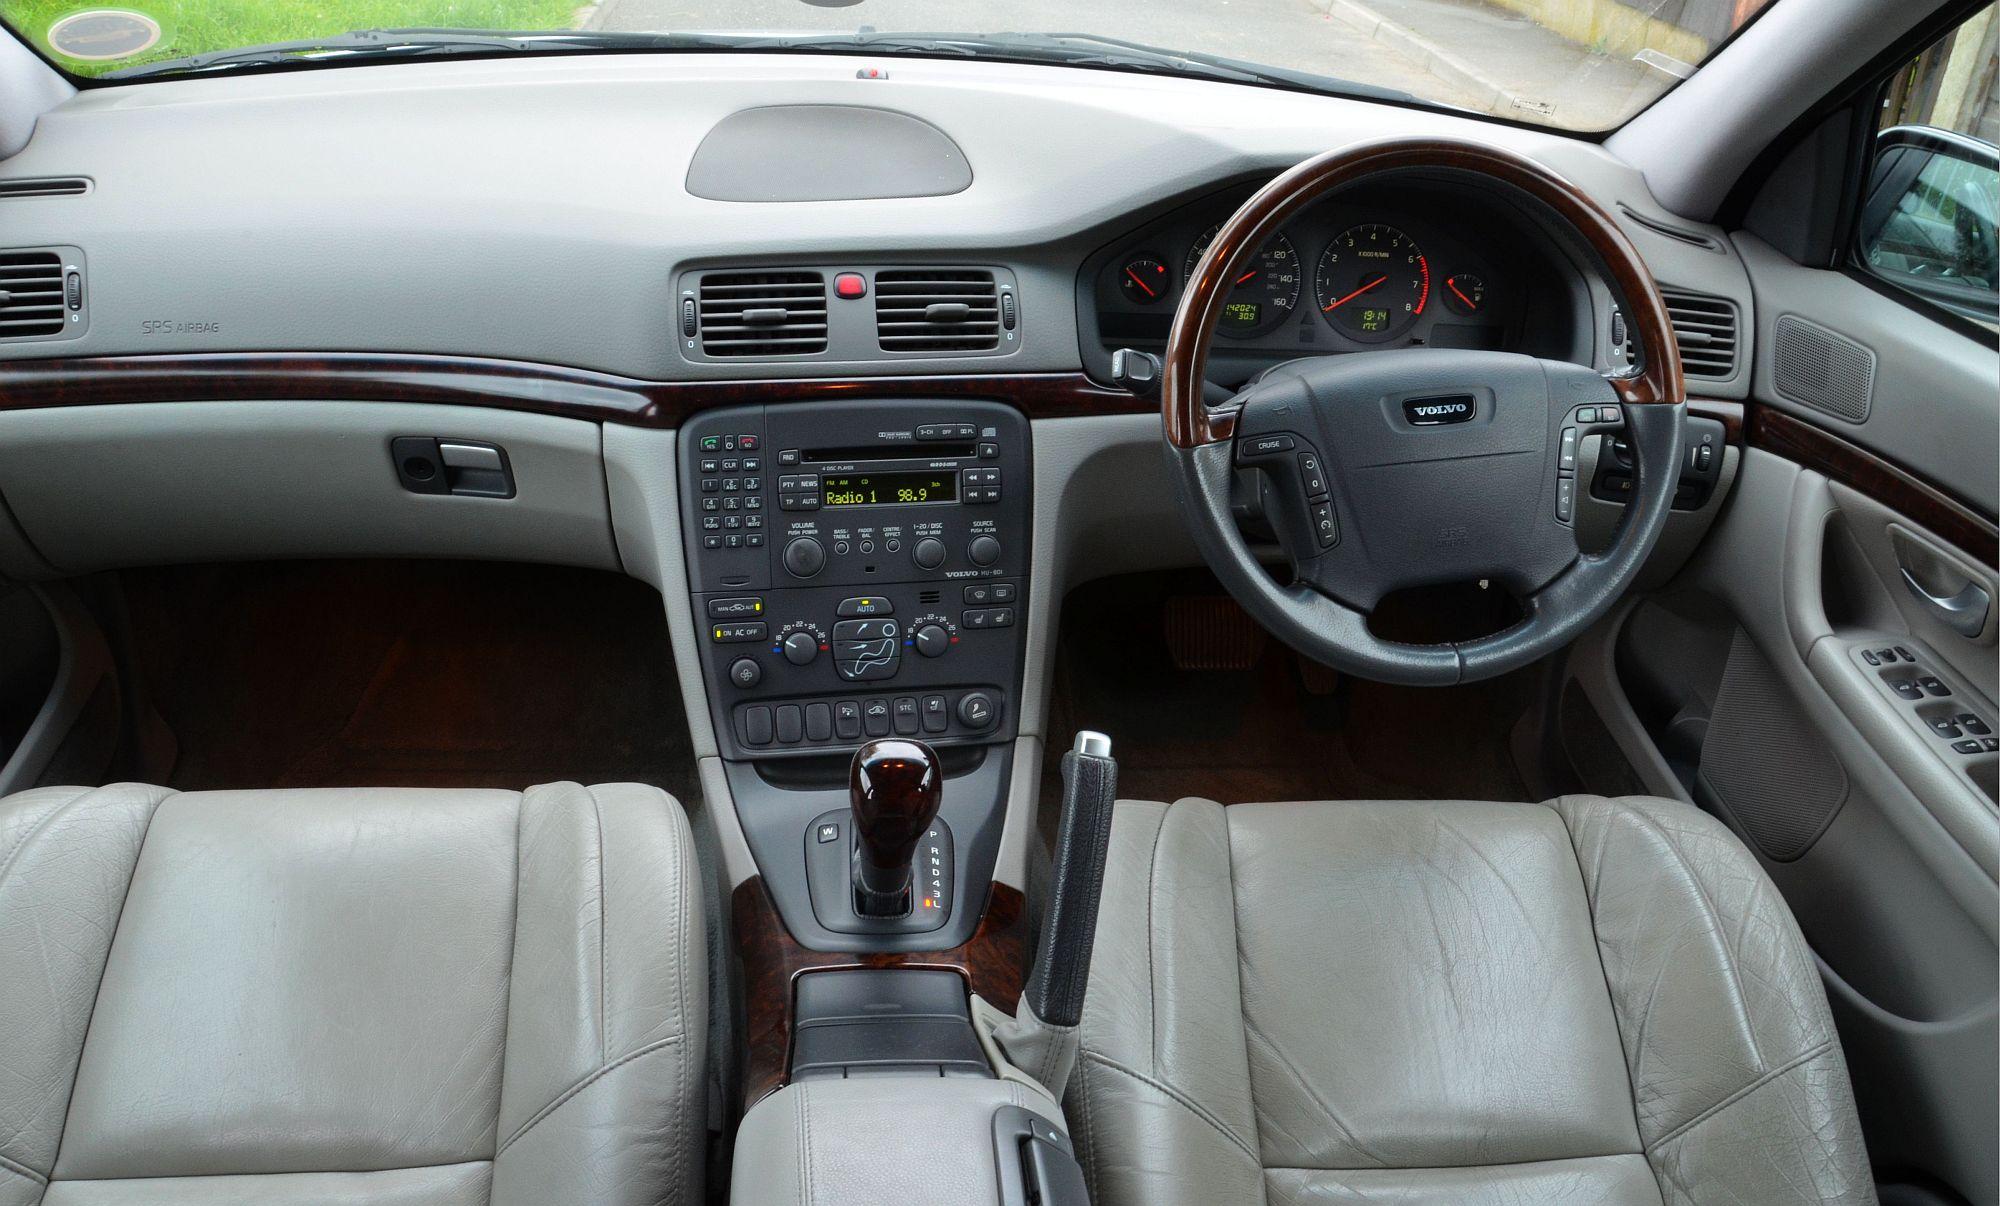 2005 Volvo S60 R Sedan 2 5l Turbo Awd Manual